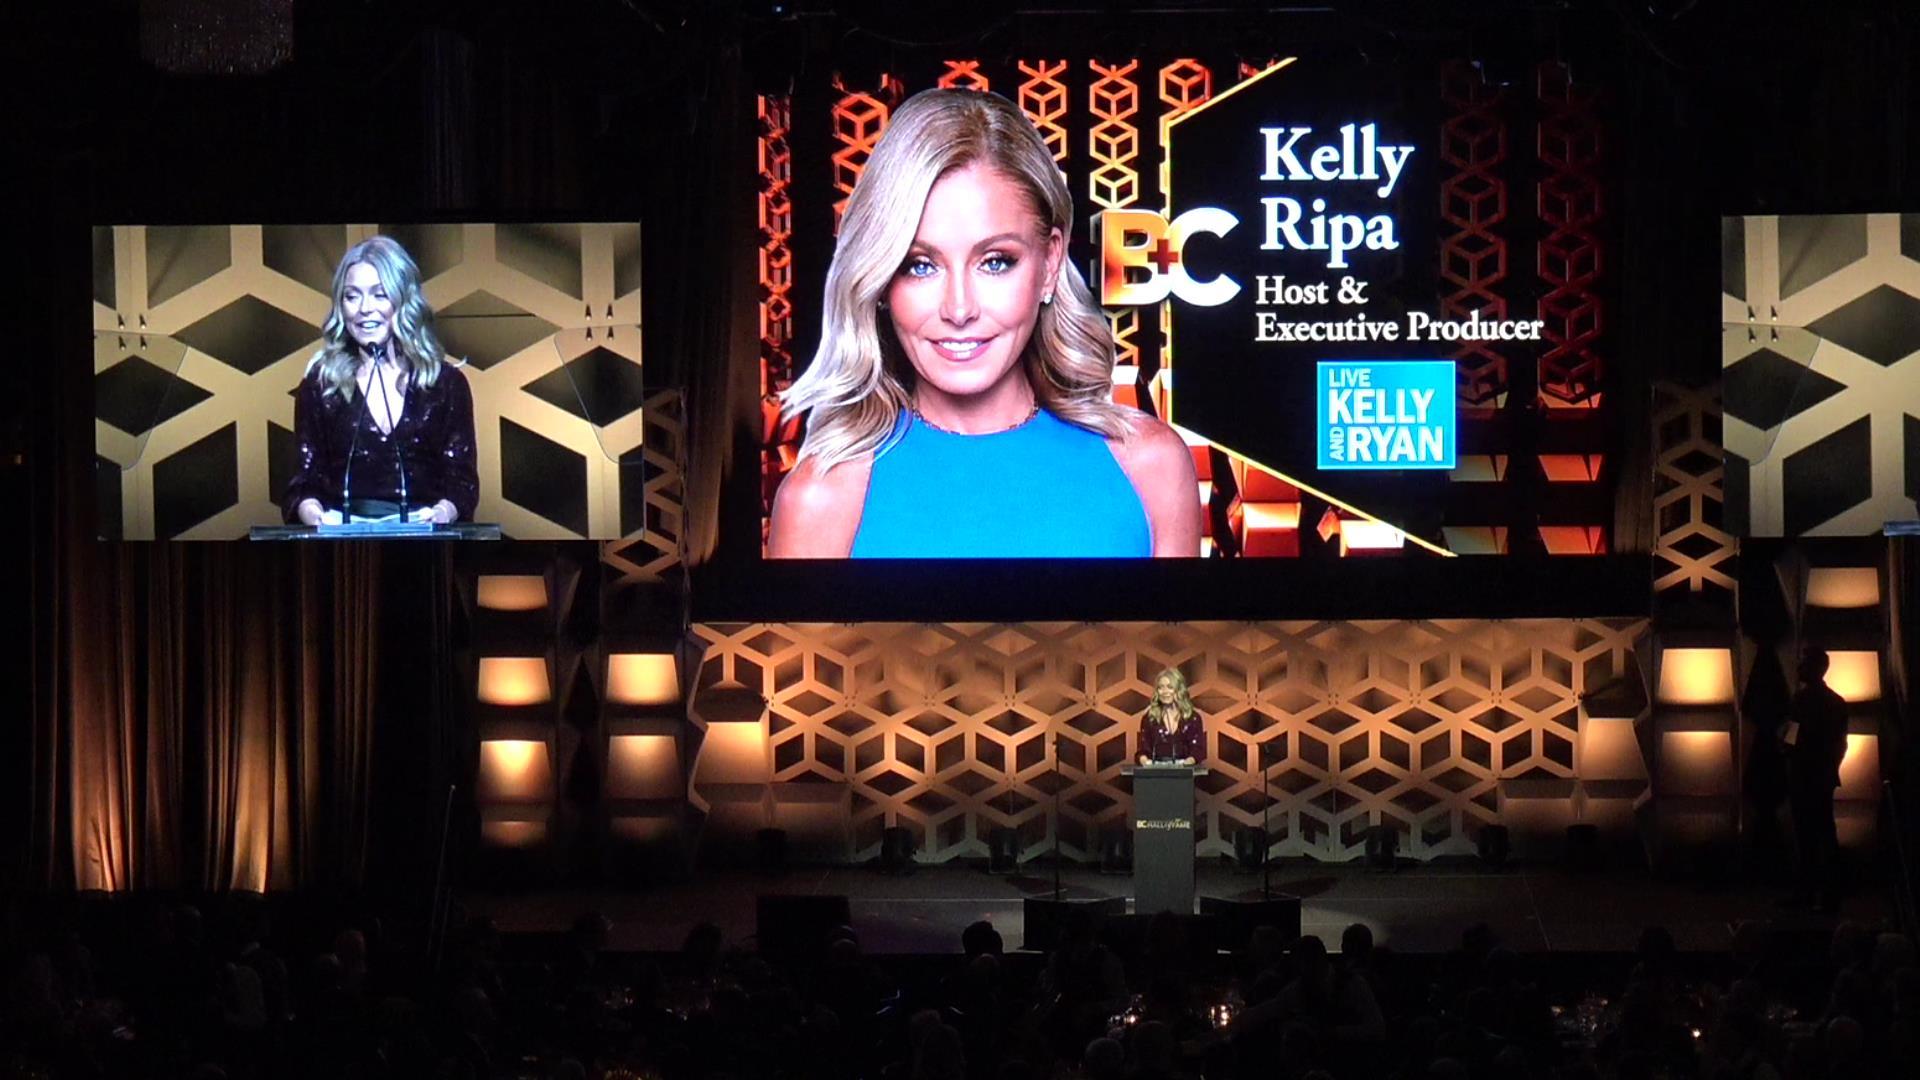 2019  Hall of Fame Honoree Kelly Ripa